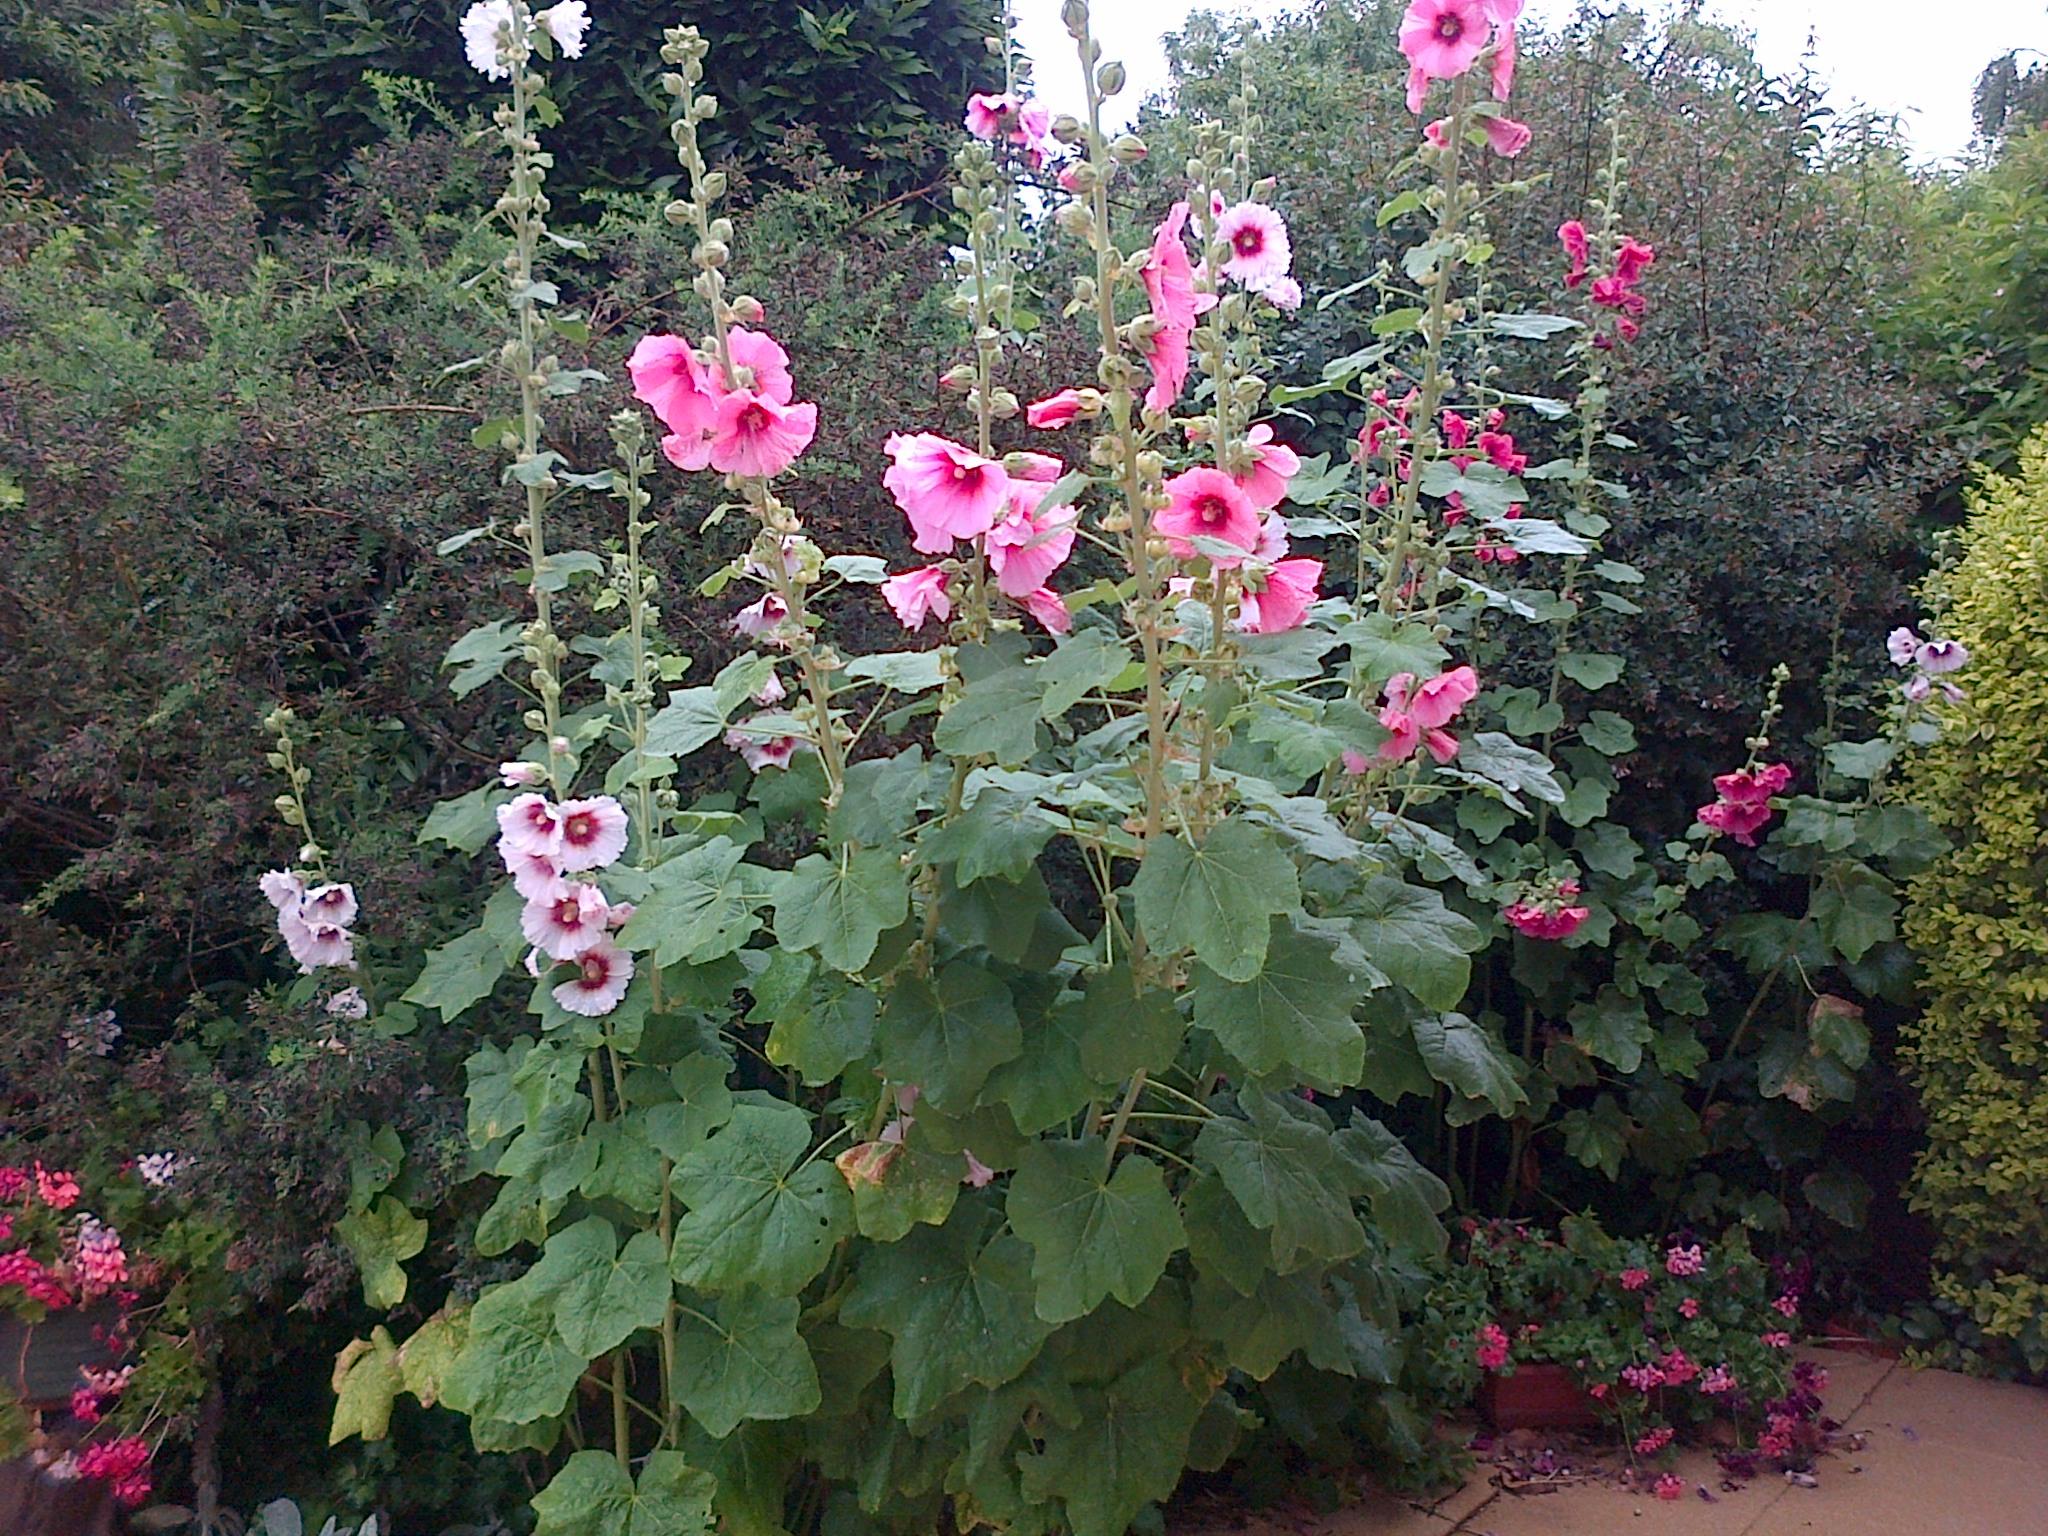 Fleurs au jardin en bretagne for Fleurs au jardin